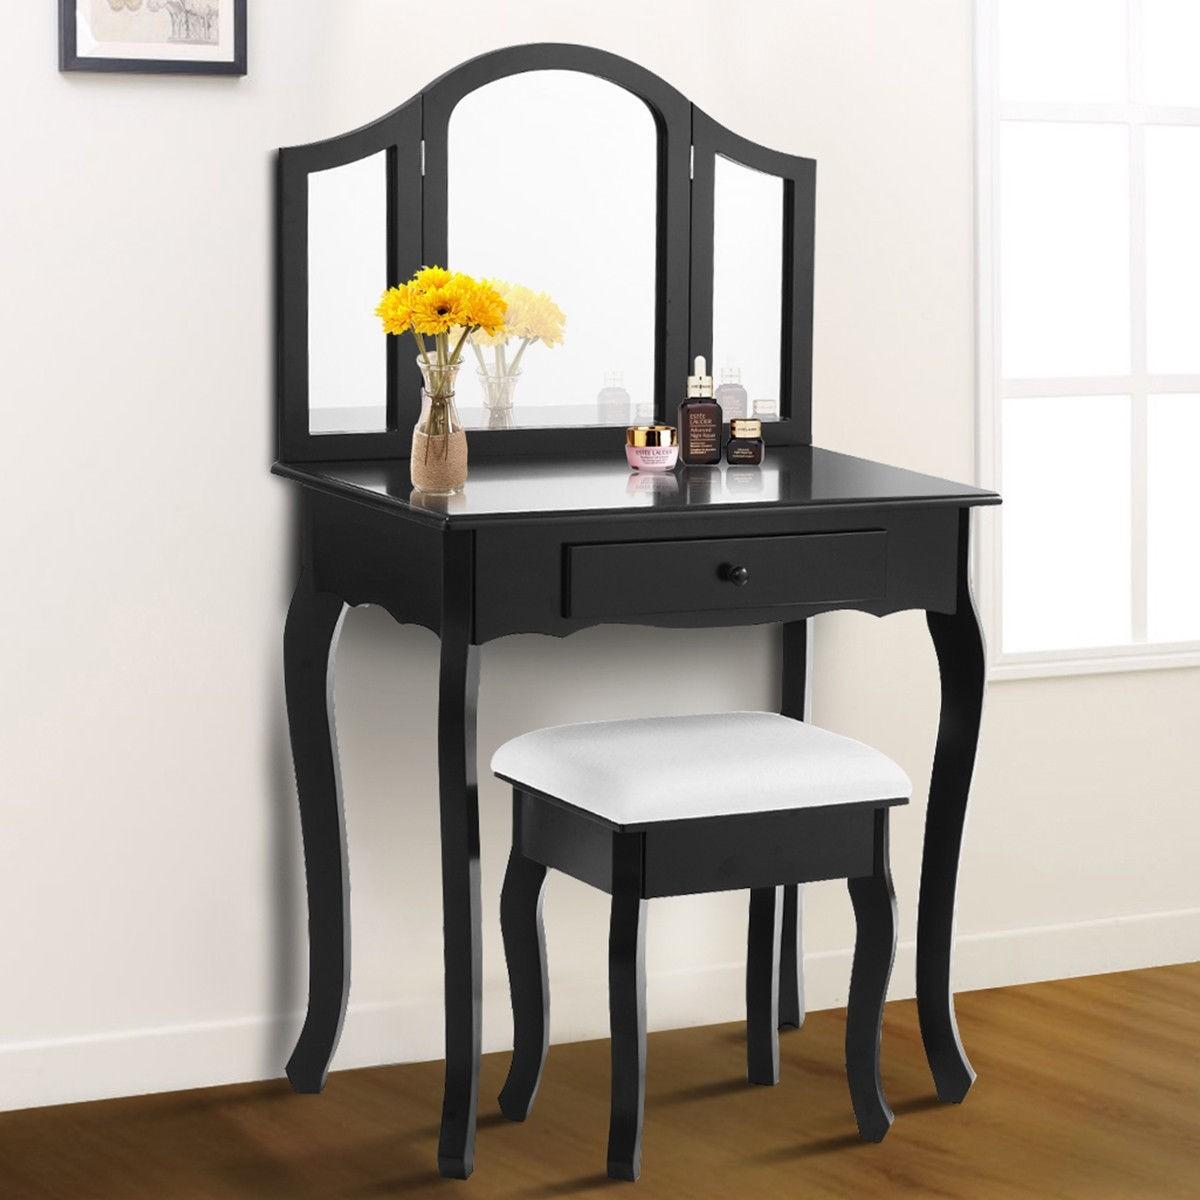 Costway Black / White Vanity Makeup Dressing Table Stool Set $99.95 + FS